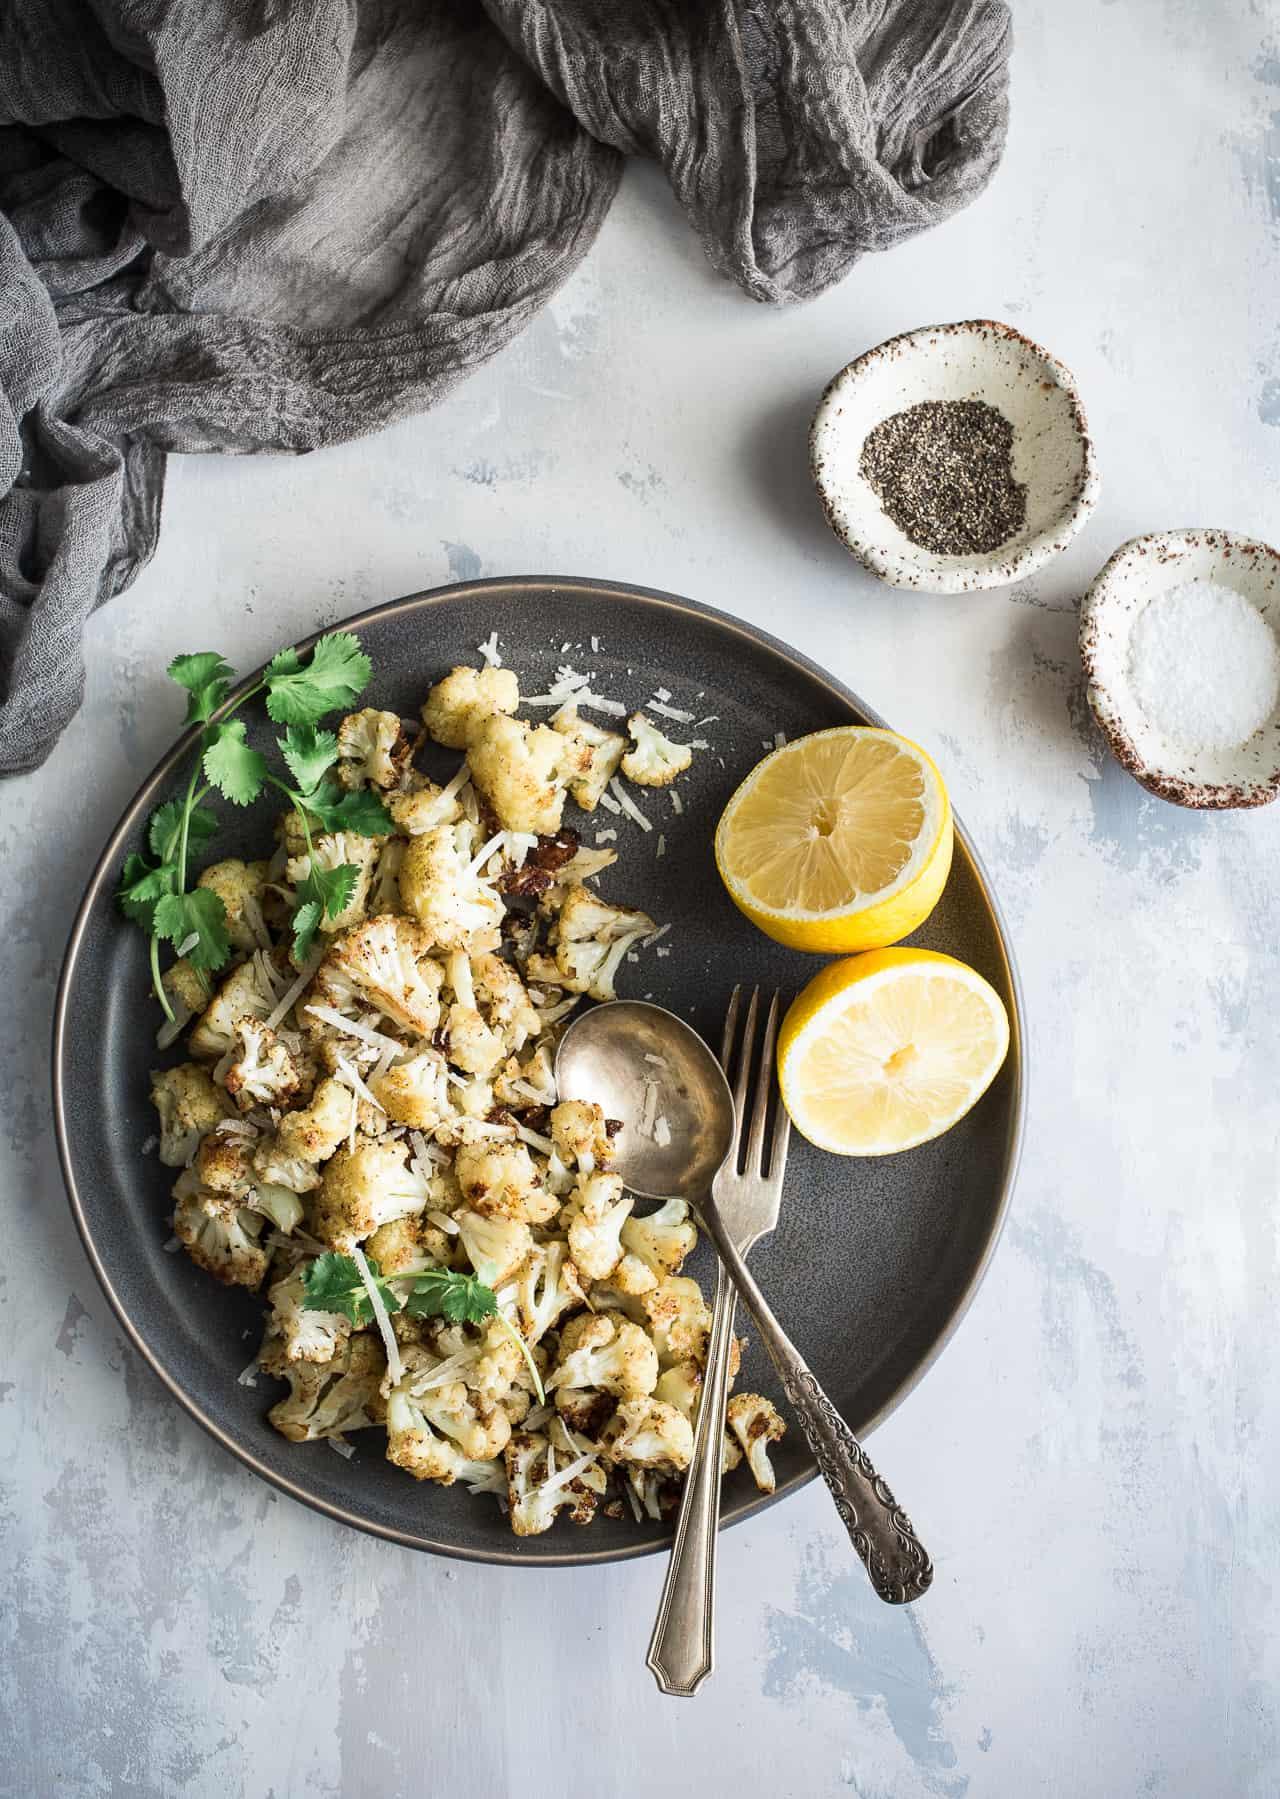 Lemon Pepper Parmesan Roasted Cauliflower